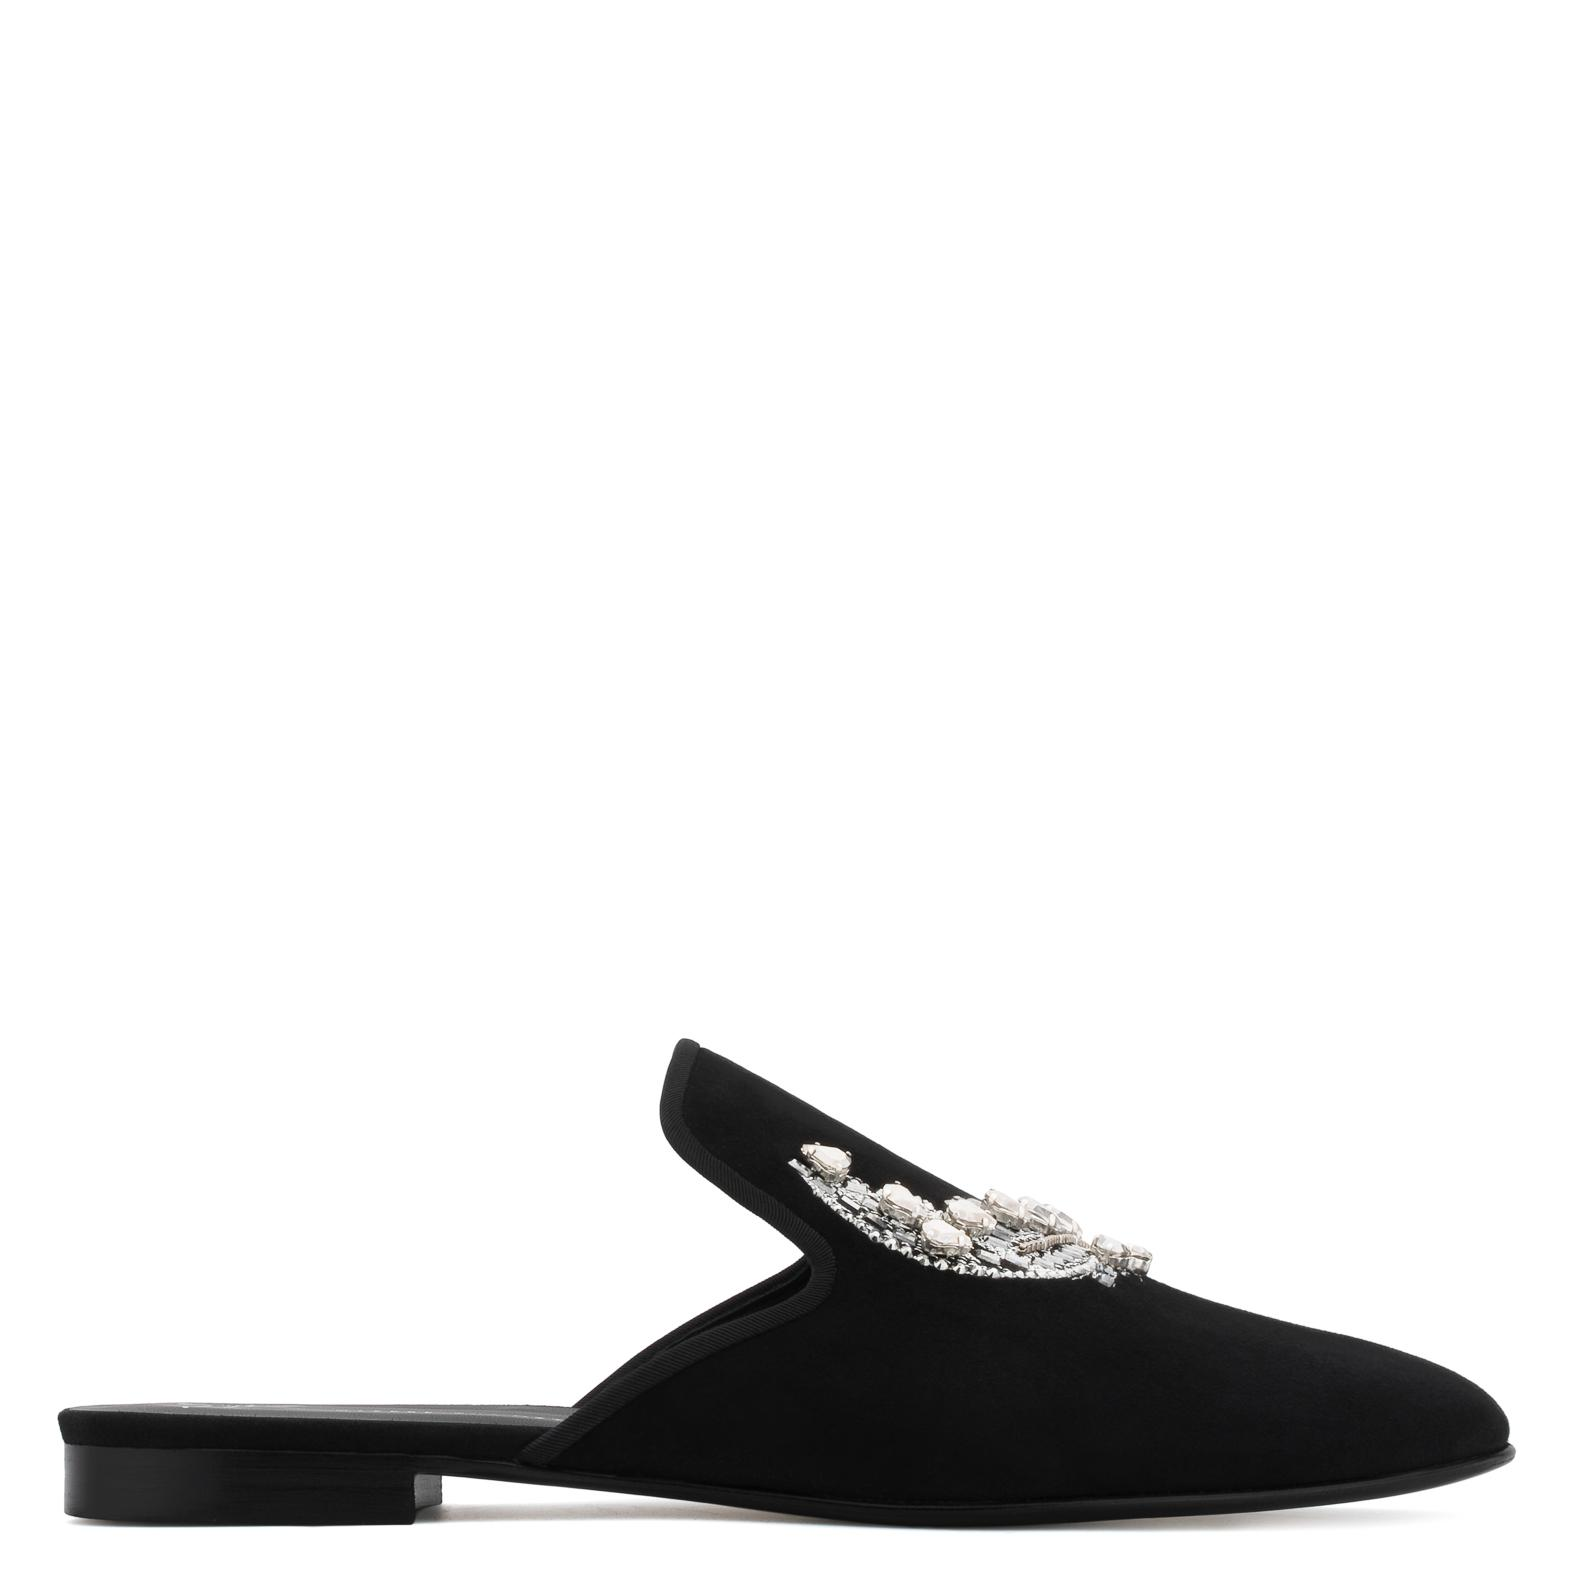 Giuseppe Zanotti Suede flat slipper with crystals MYRON 4Ztar9E1M